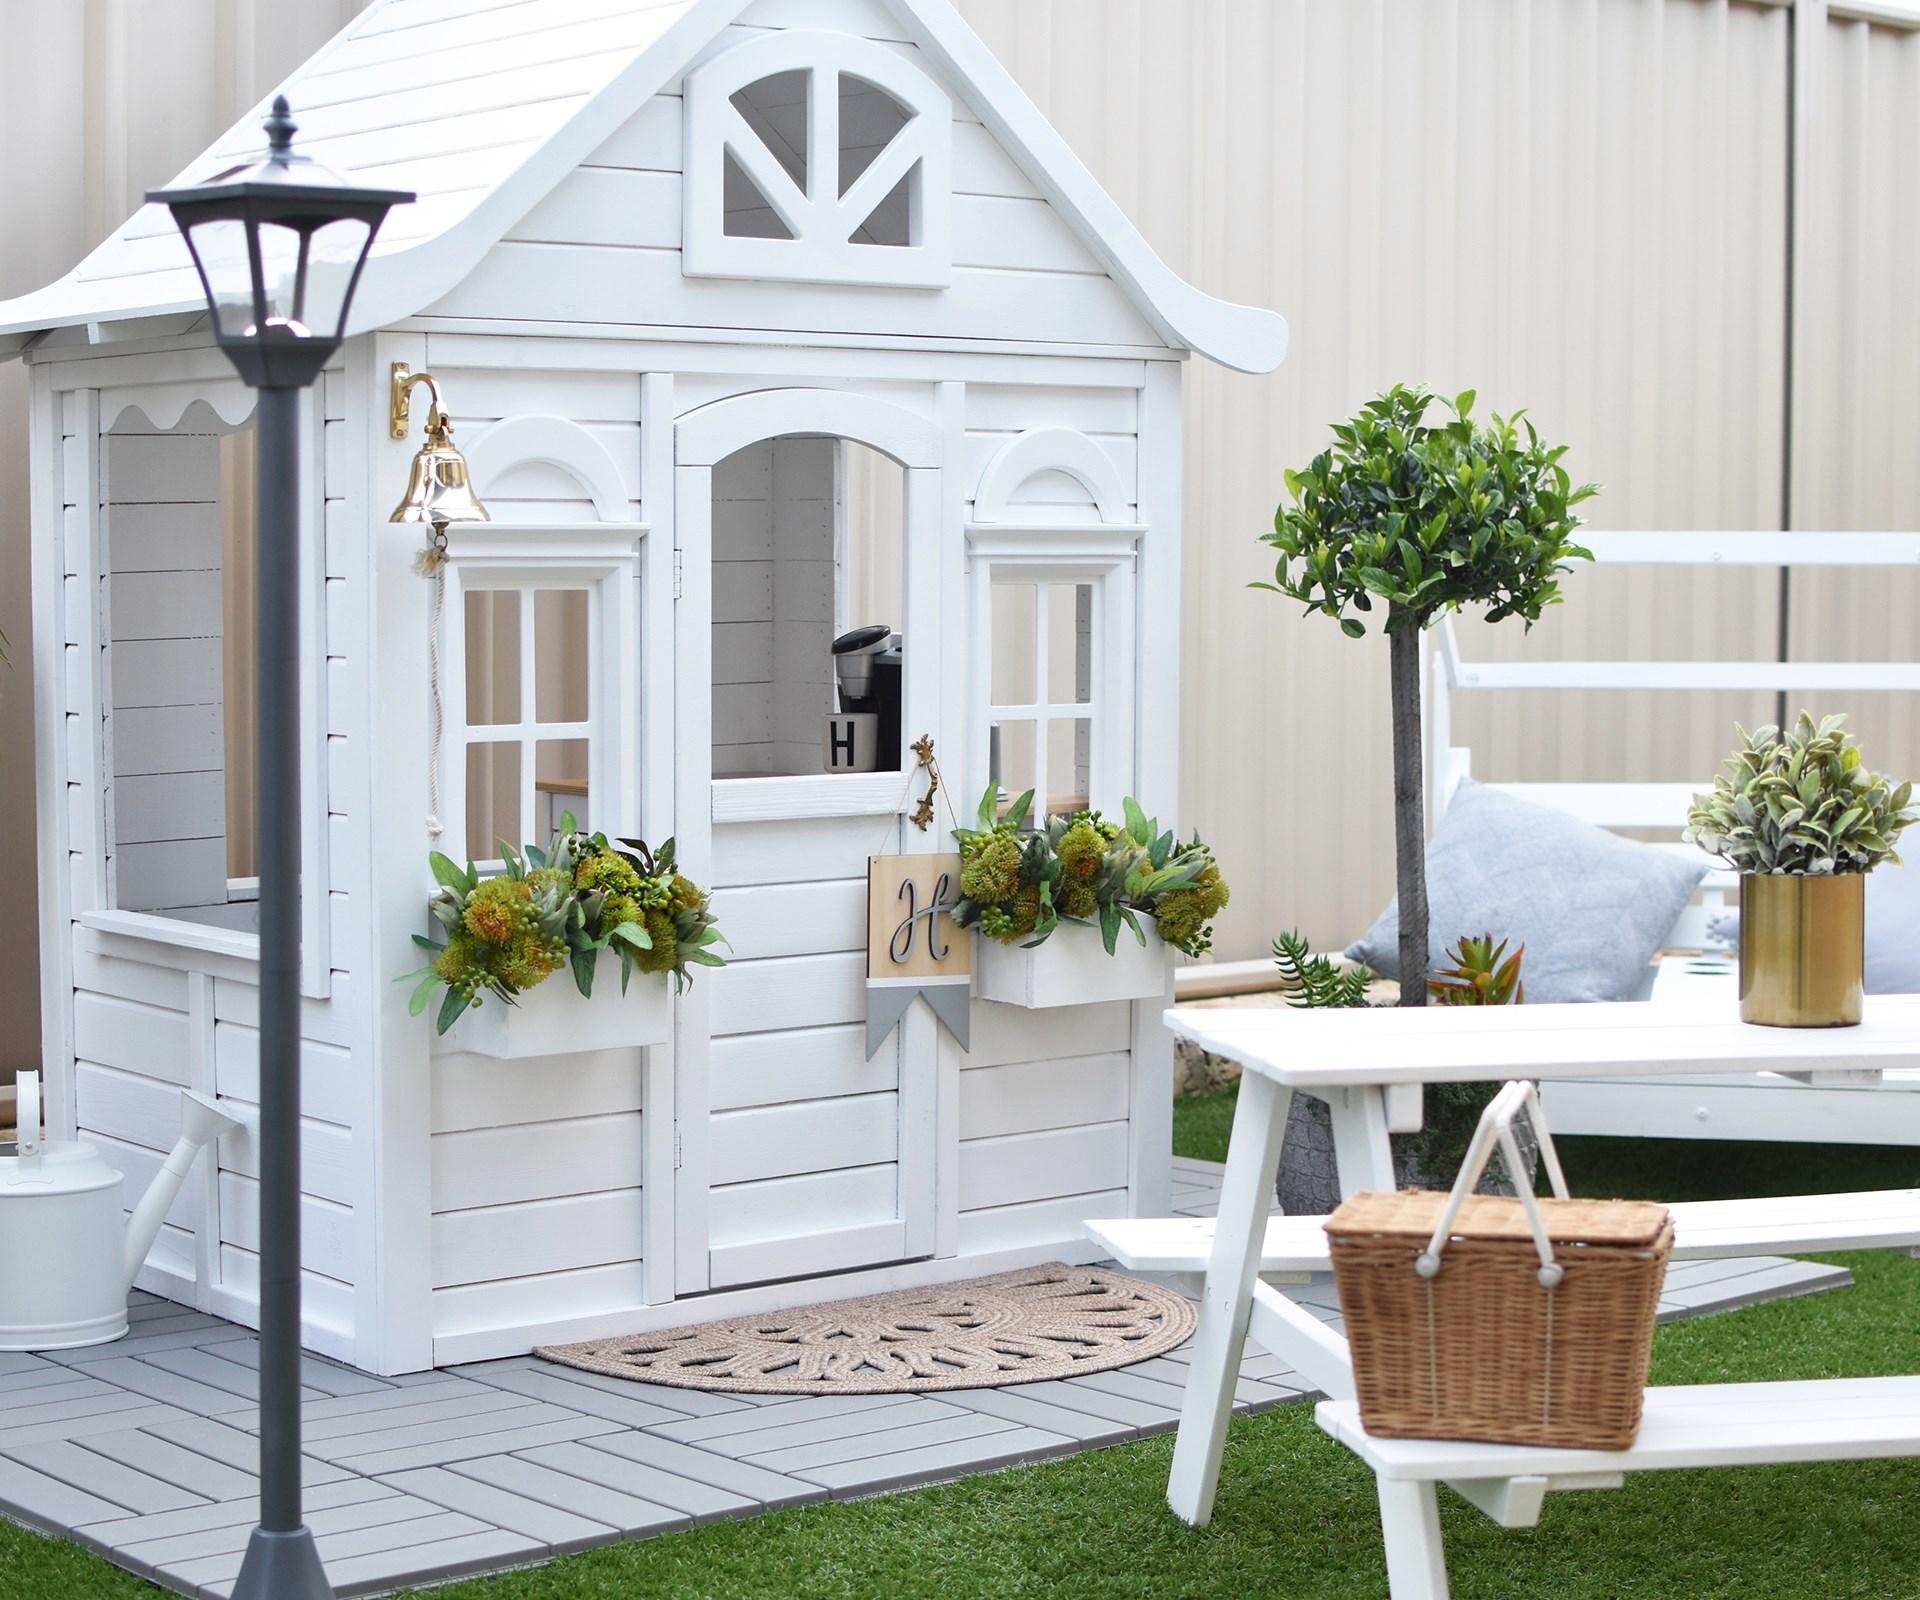 cubby house furniture. Cubby House Furniture